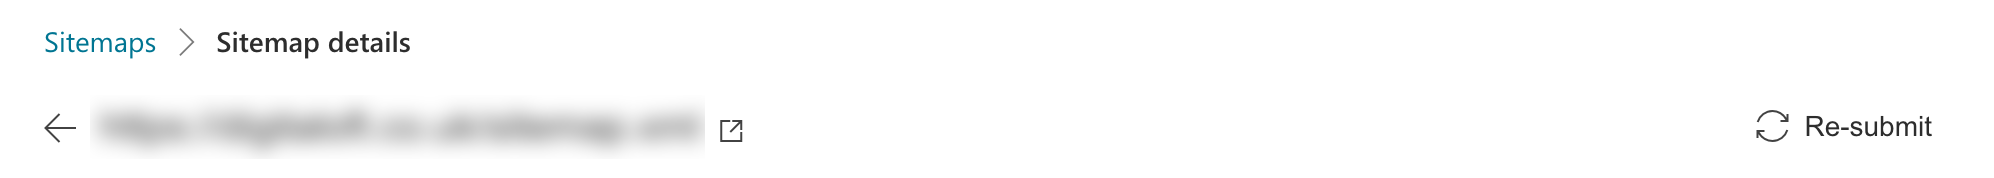 rRsubmit button in Bing sitemap